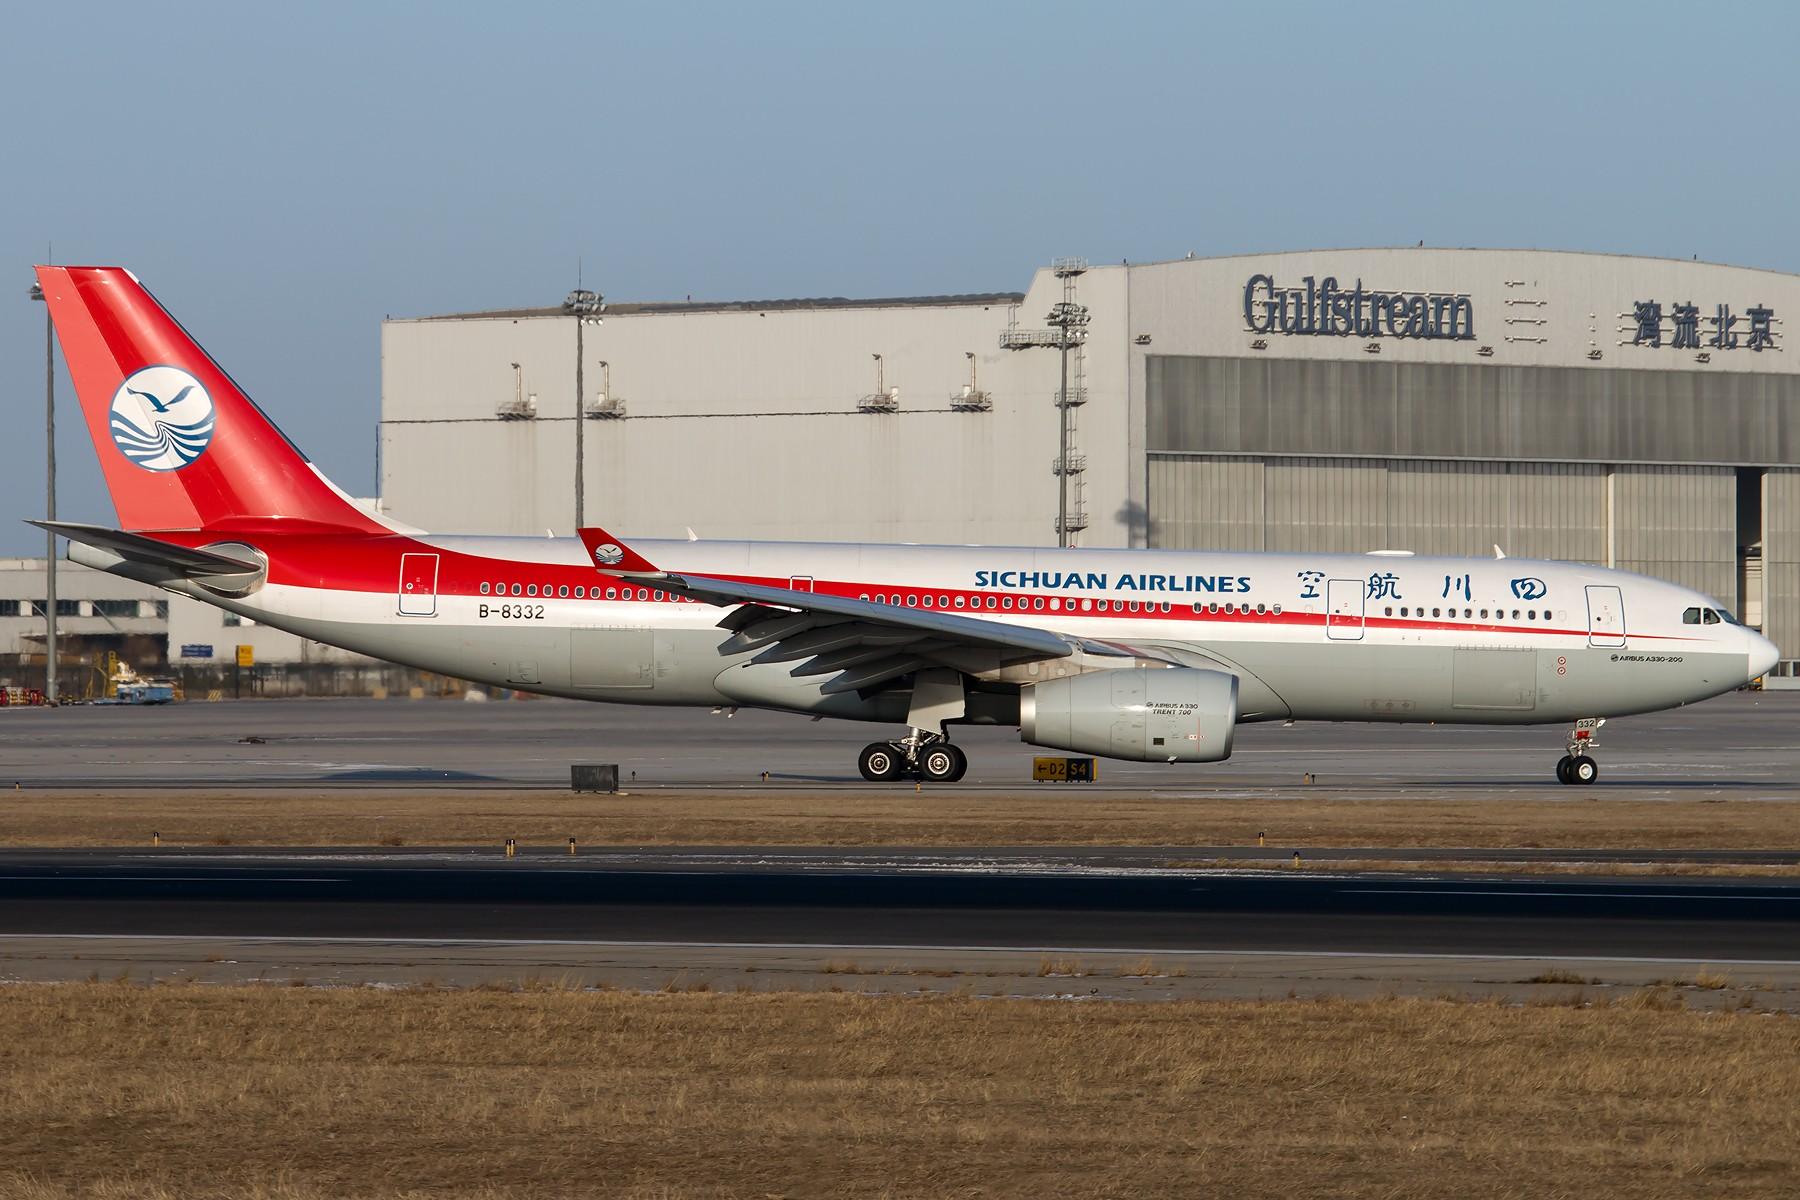 Re:[原创]2016-01-18 杂图10张 1800*1200 AIRBUS A330-243 B-8332 中国北京首都国际机场